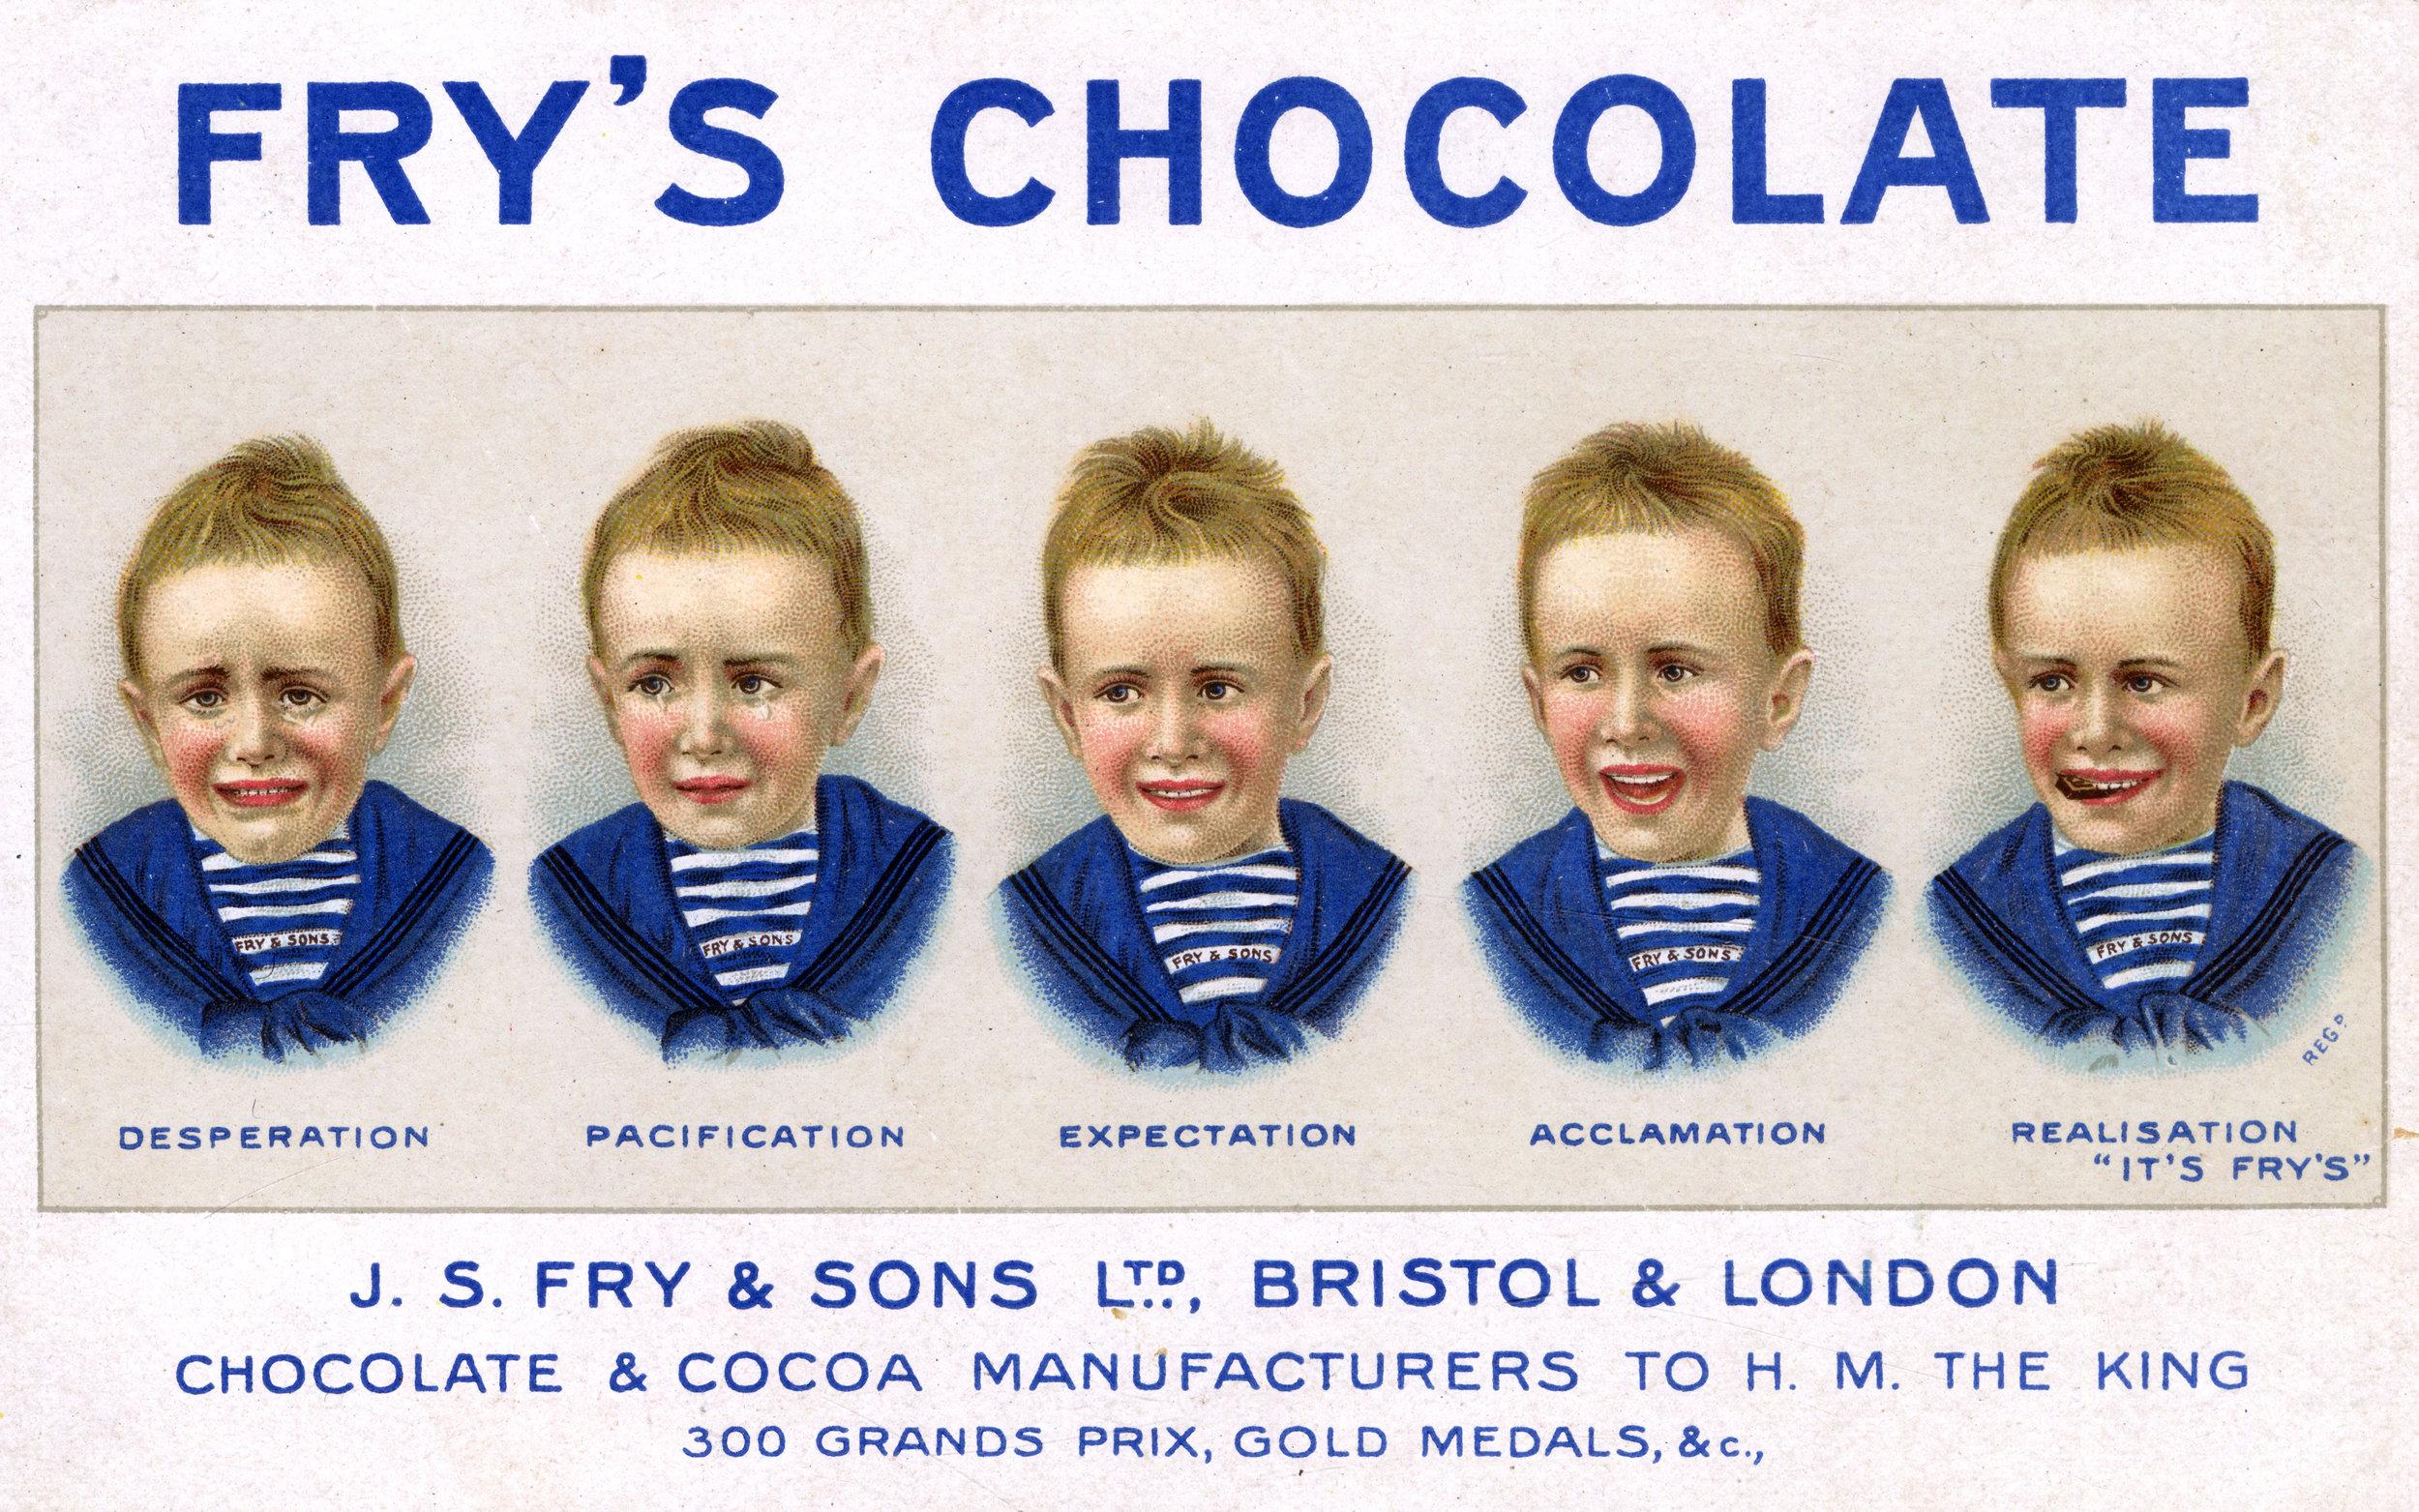 frys-chocolate-retro-advert.jpg